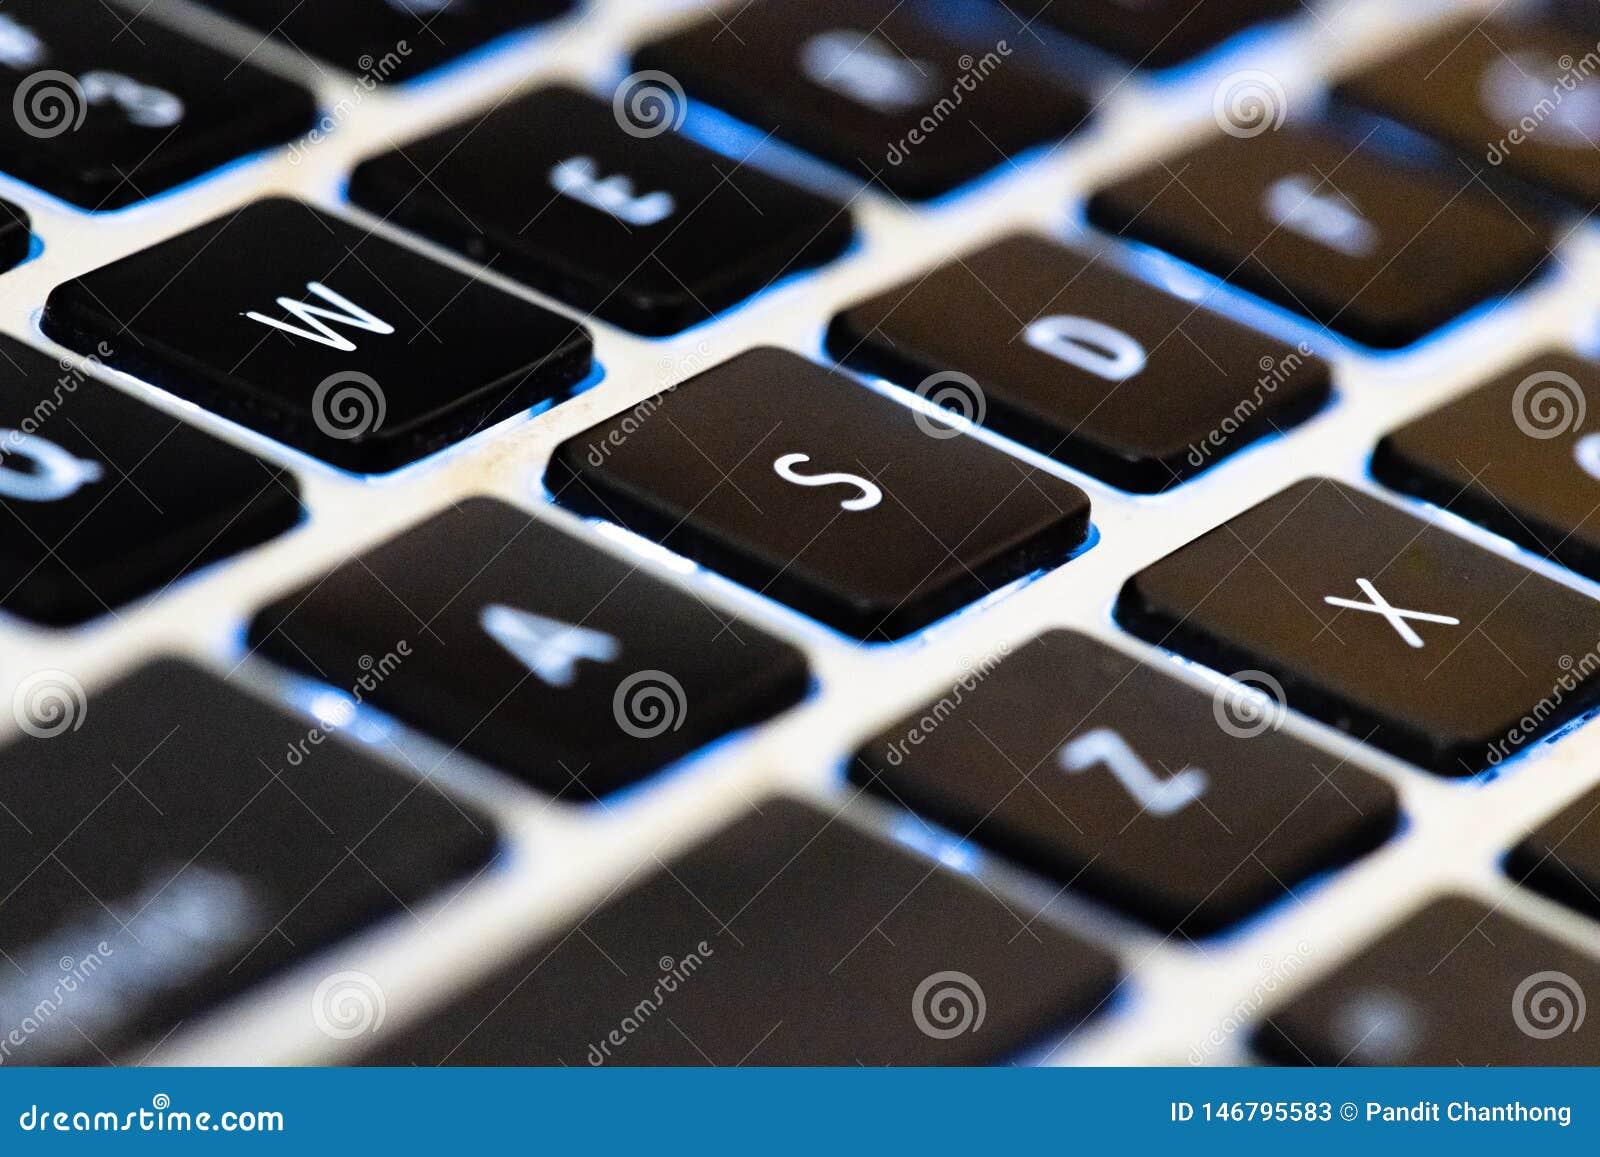 Sluit vlakke toetsenbordlaptop voor vervoeren en uitputten Internet voor mededeling drukknop voor inputgegevens in toetsenbord ov